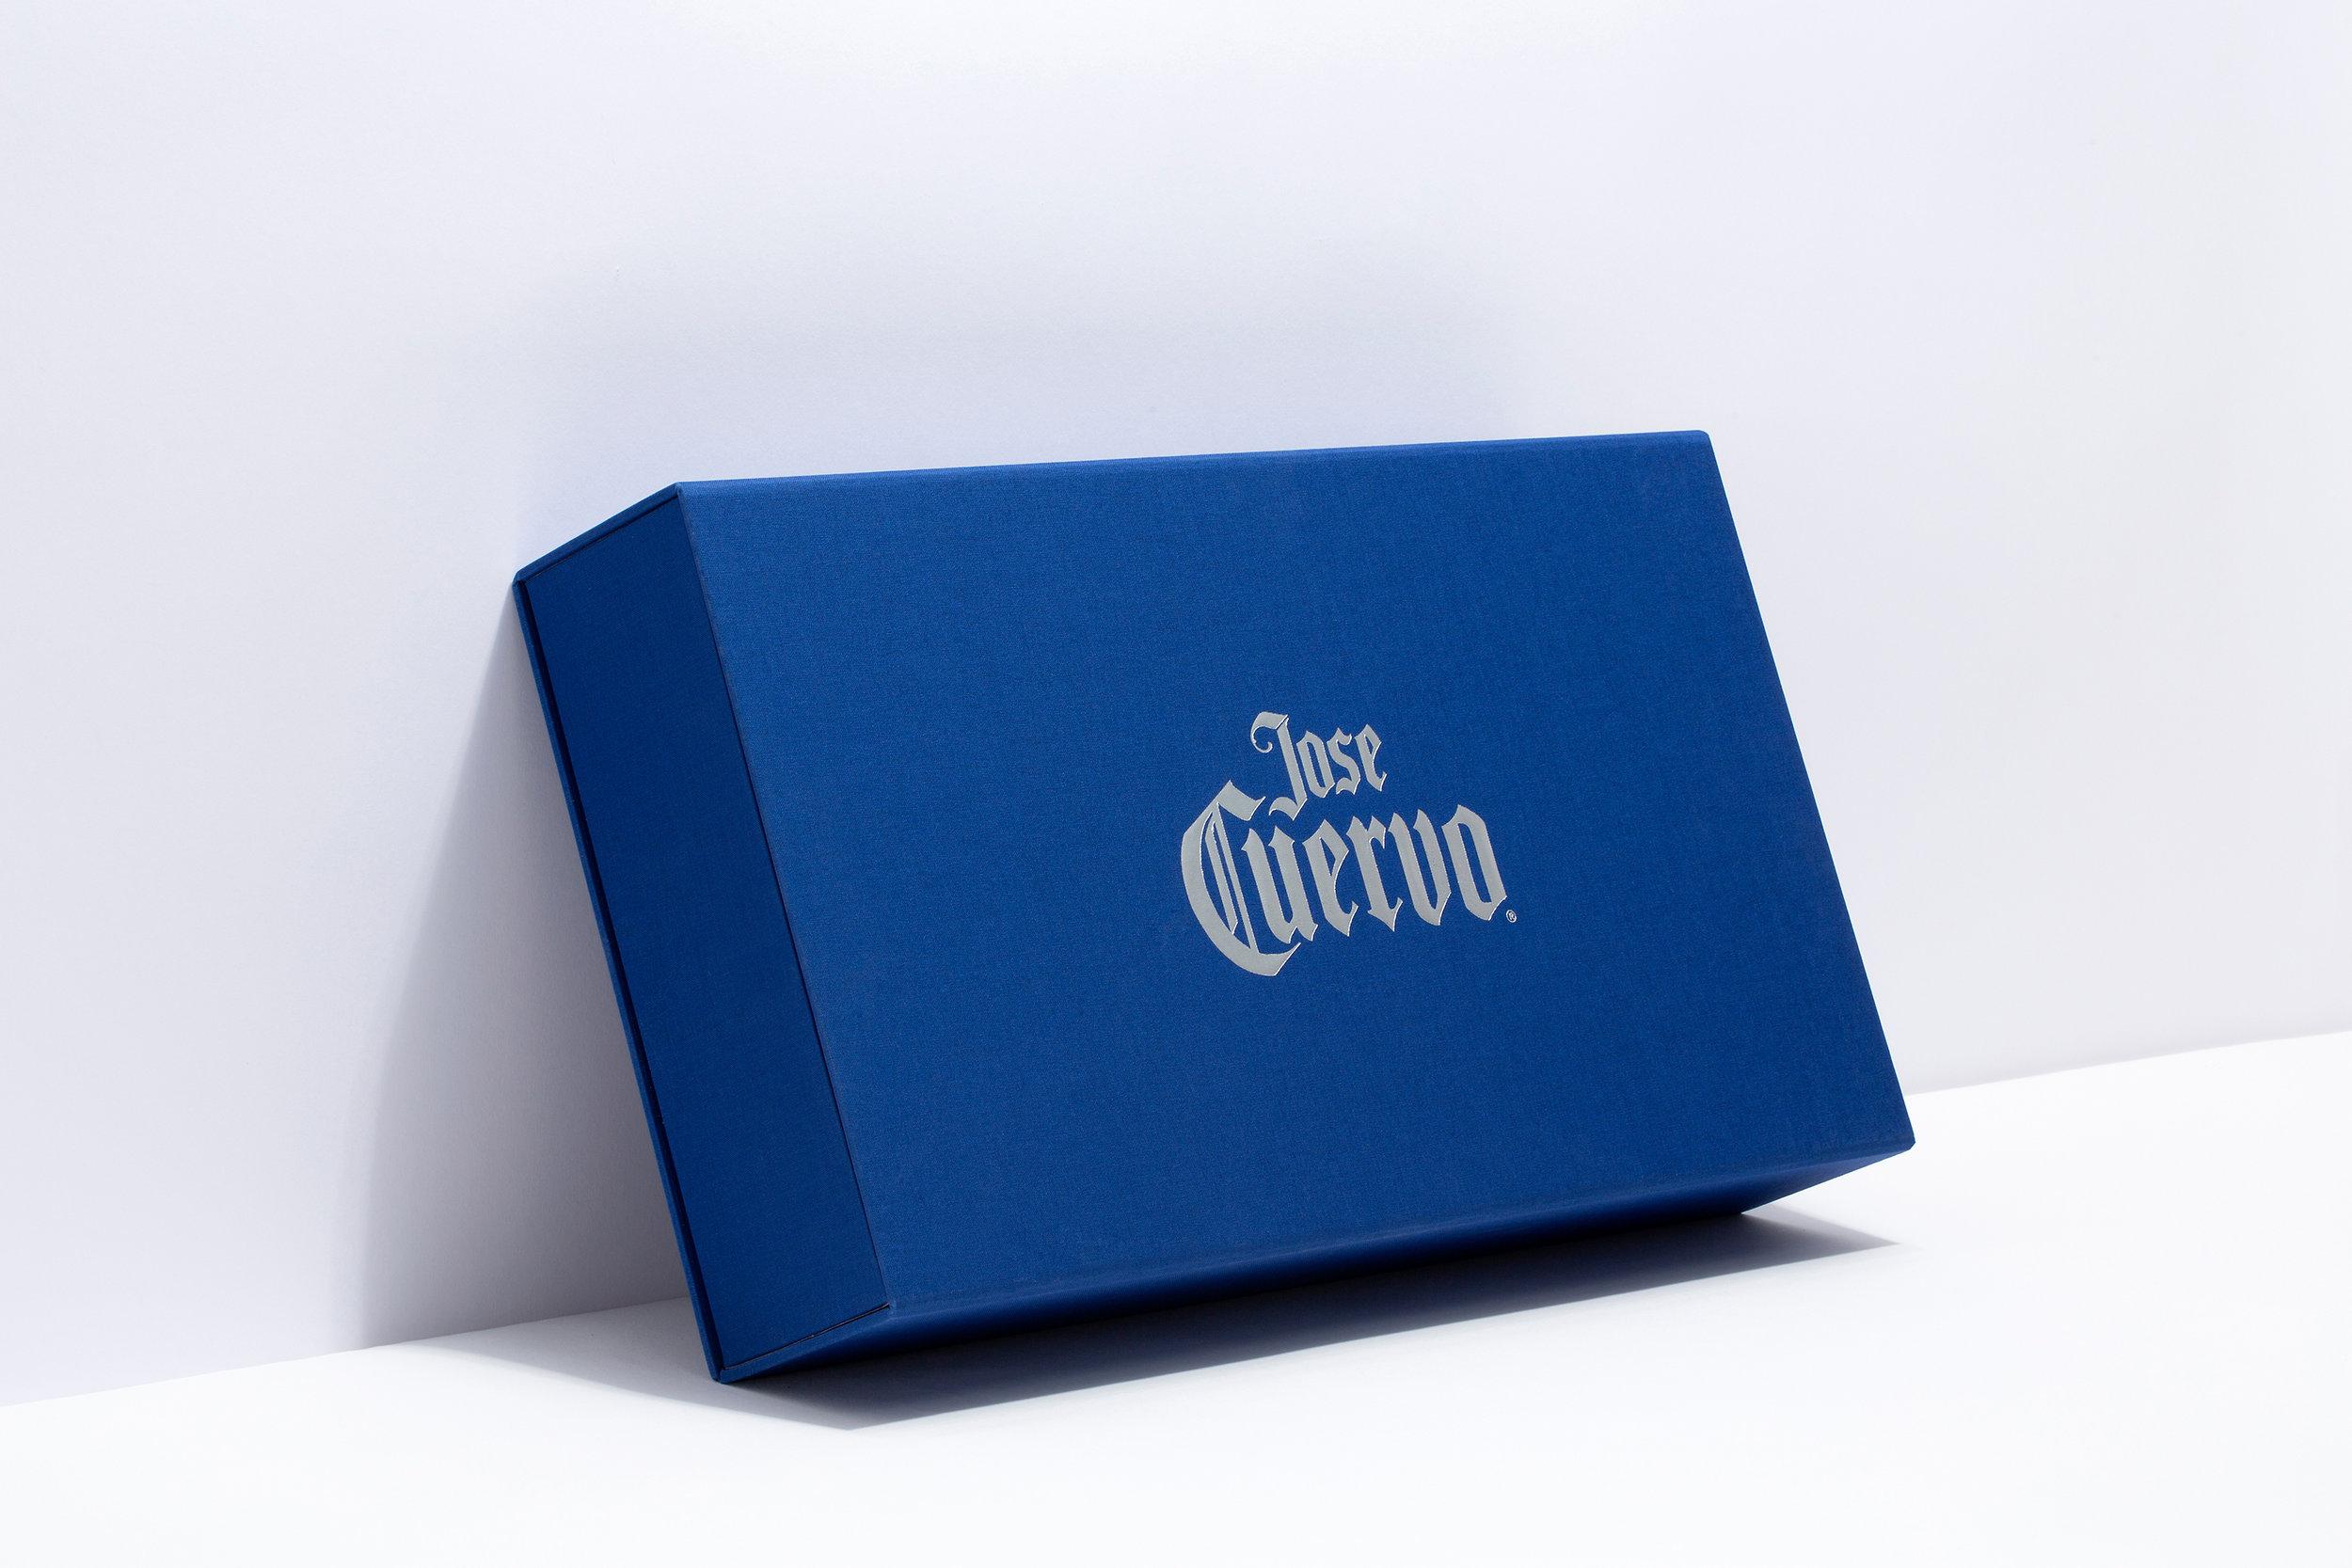 Jose_cuervo_box_1.jpg